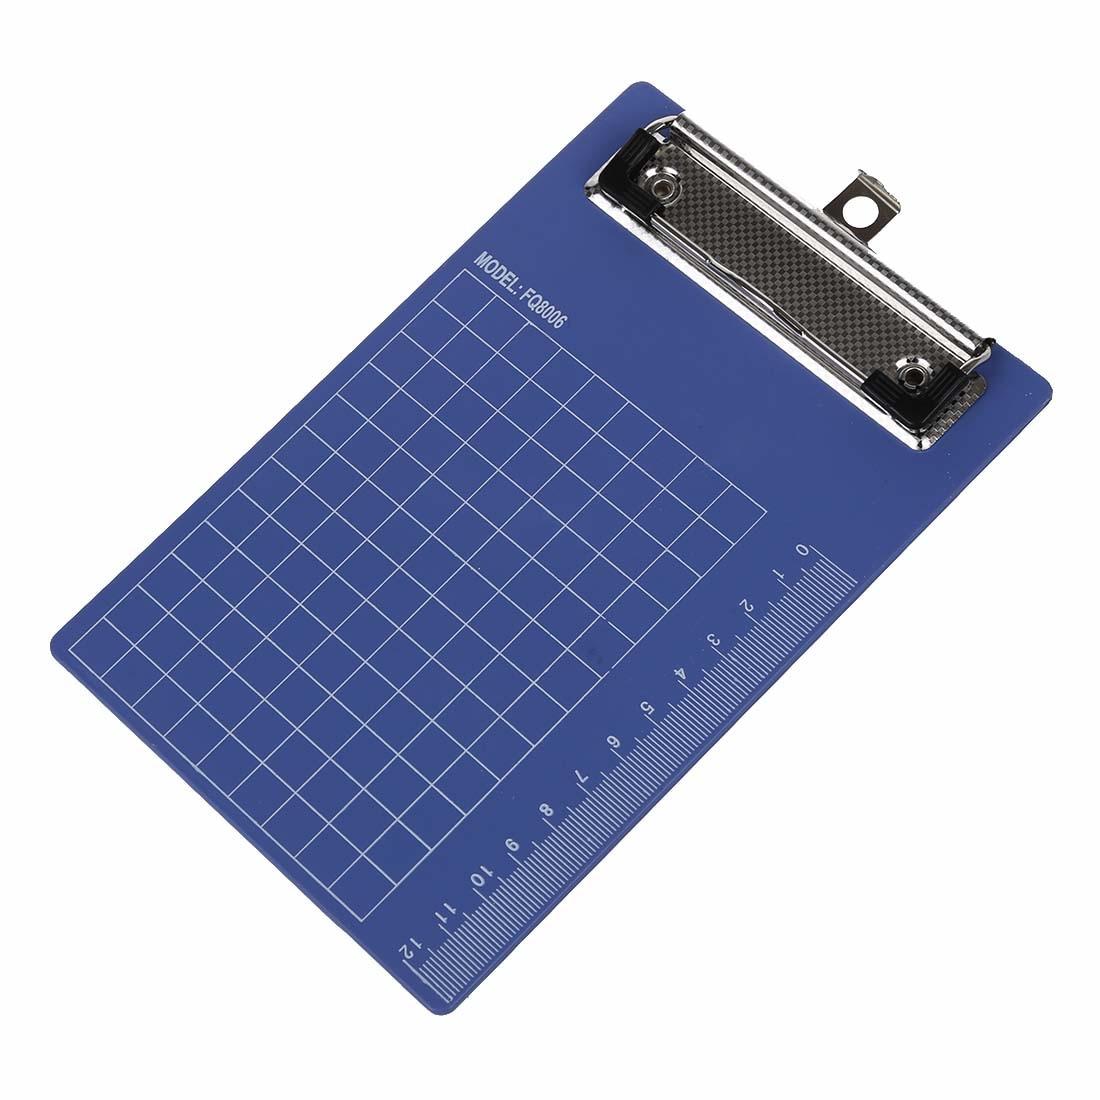 Pad Clip Holder Folder Plastic Clipboard Blue Purple For Paer A6